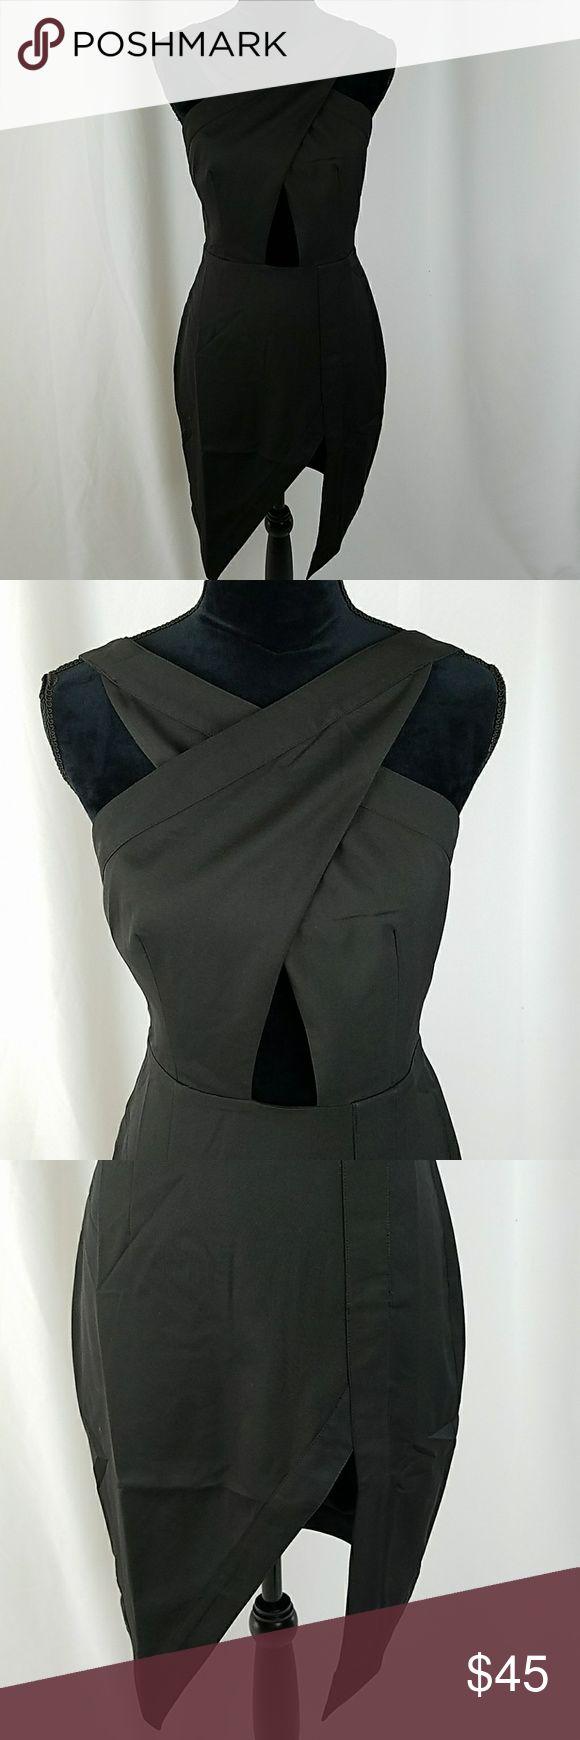 "NBD women M black mini dress clubwear front slit NBD women M black mini dress clubwear front slit, 96% polyester, 4% elastane, hand wash, MSRP $180.  Waist side to side: 14.5"" Length: 39"" NBD Dresses"